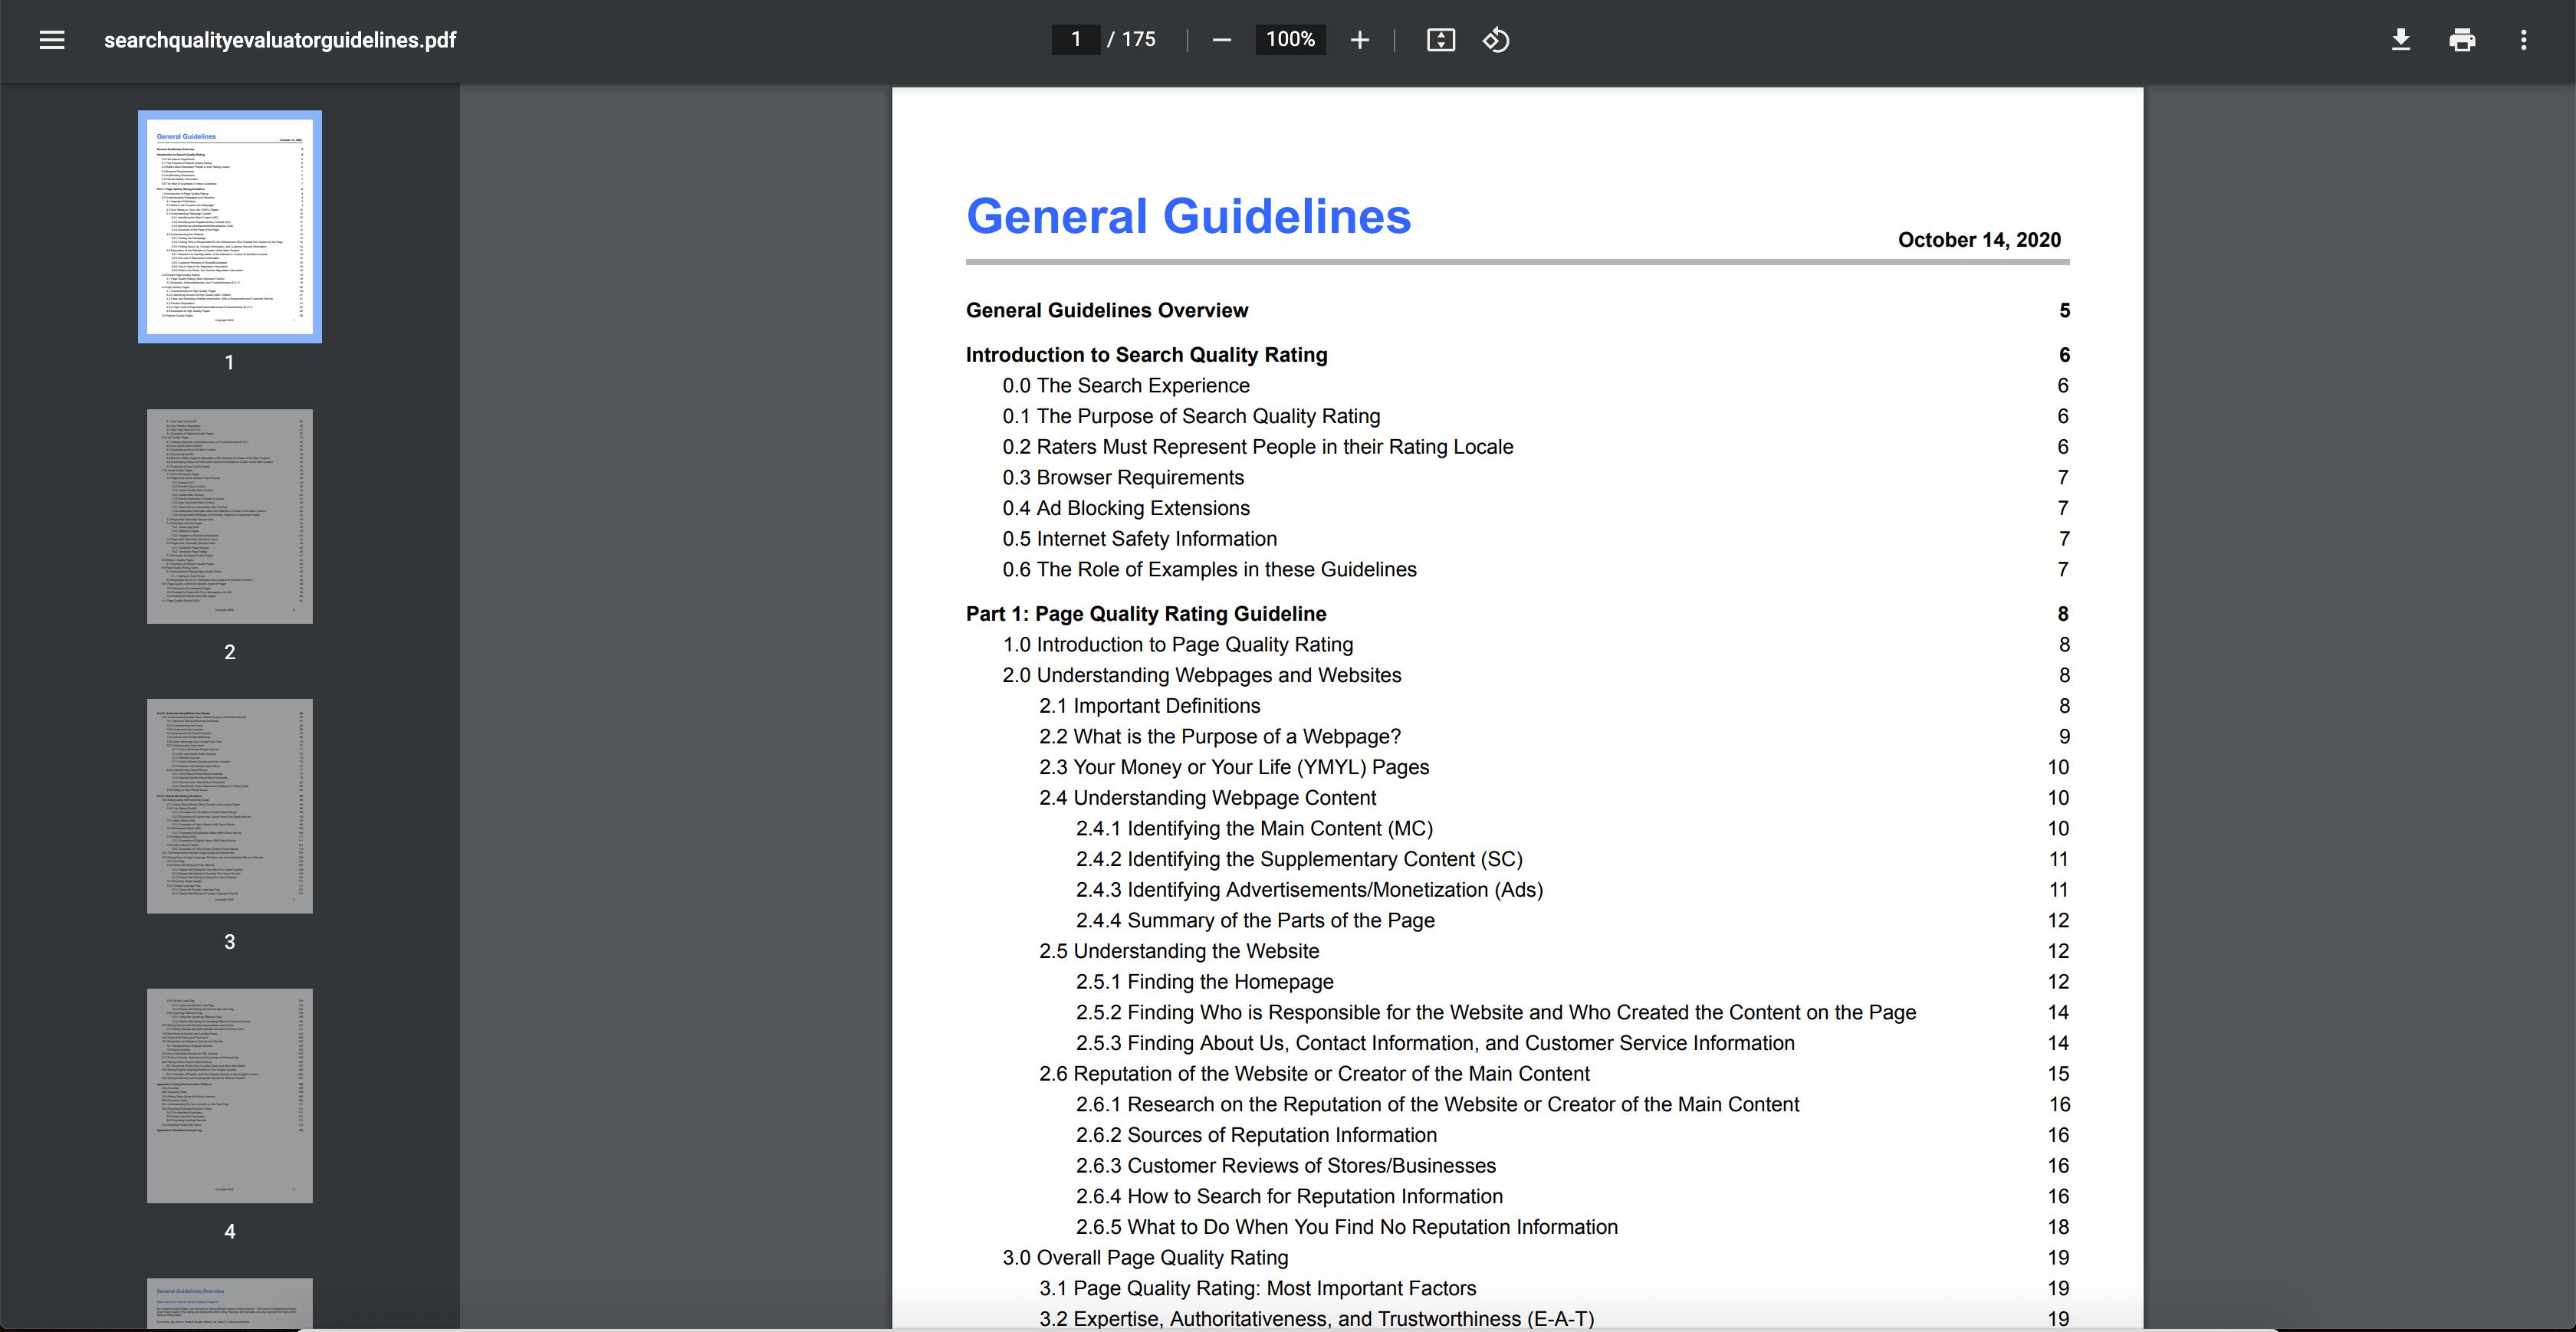 5a manual divizie anonima google